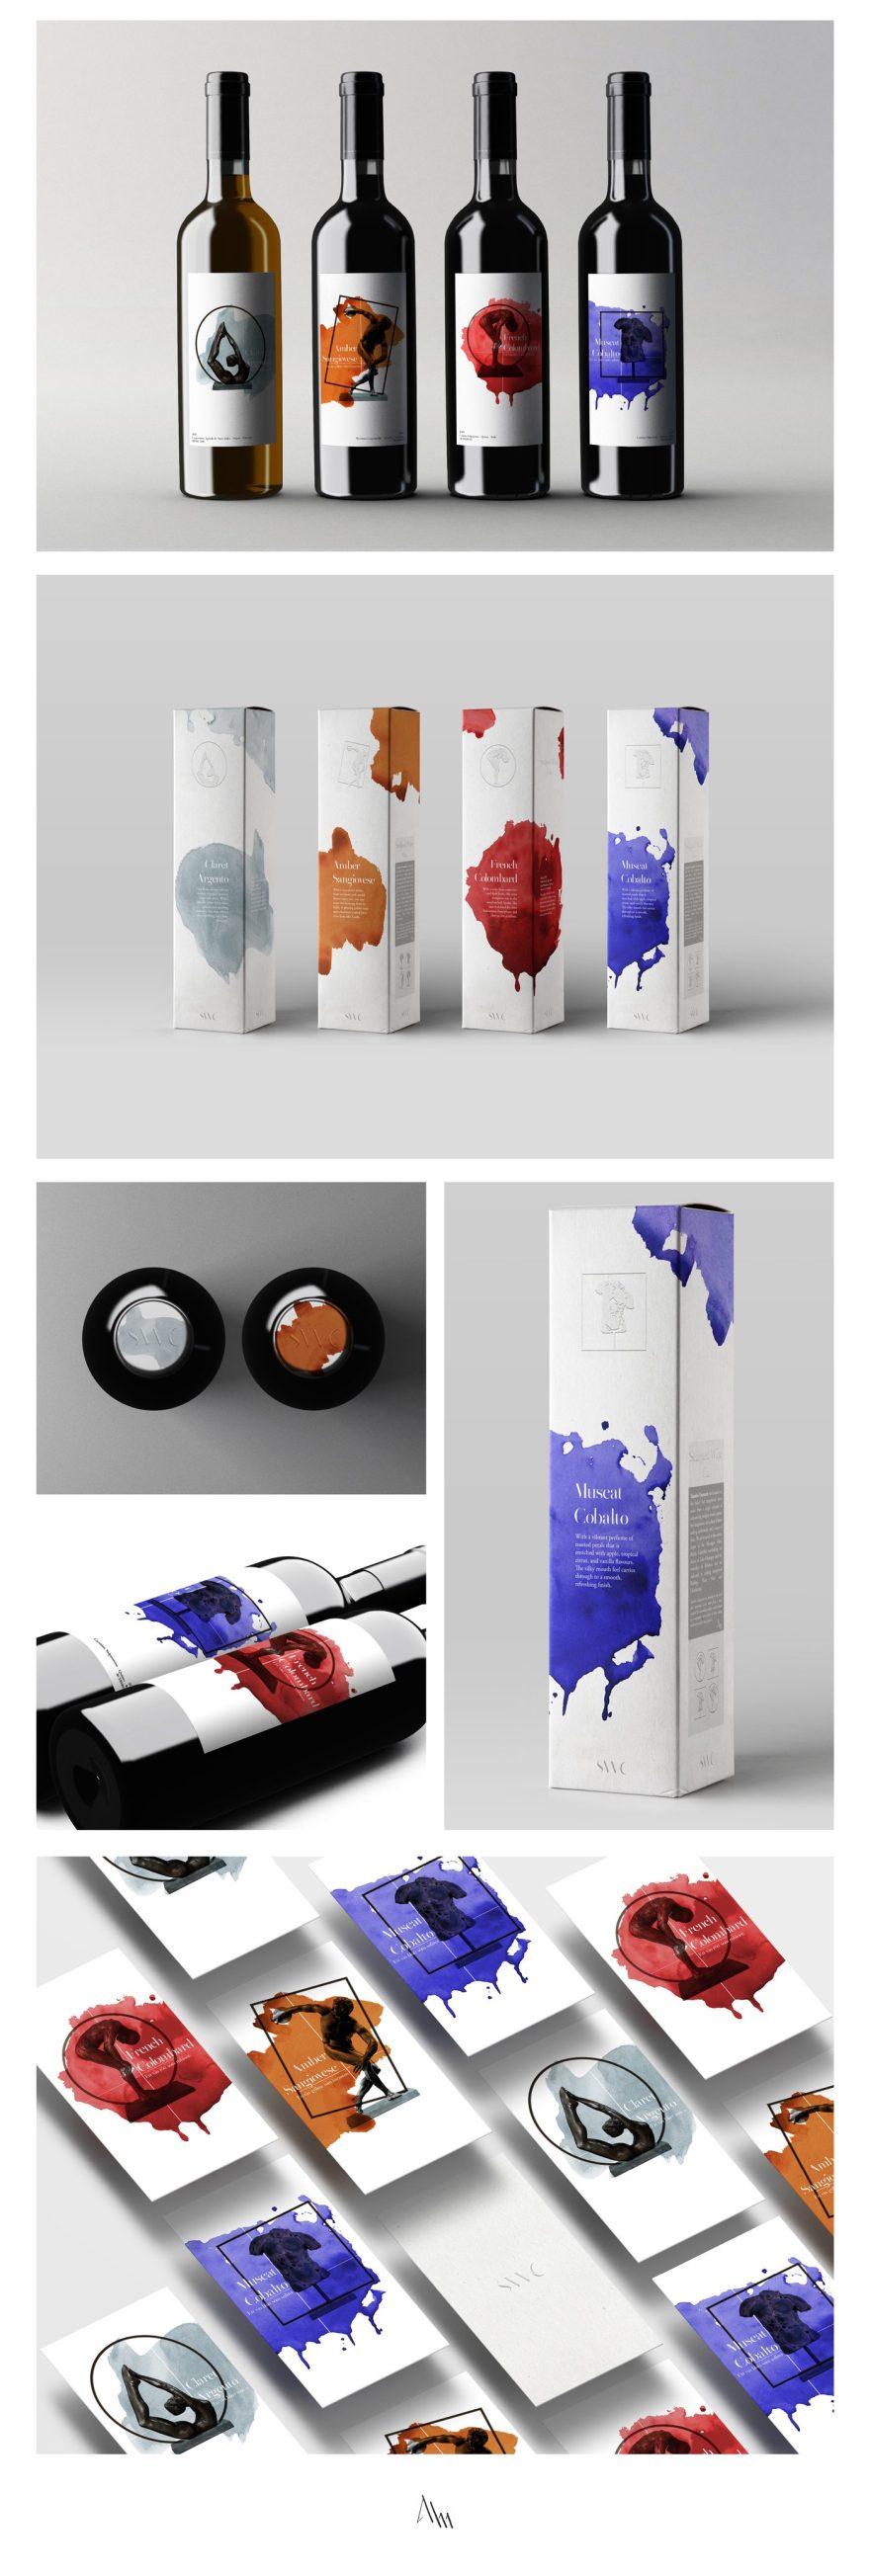 wine design, packaging design, logo design, graphic design, johannes alm